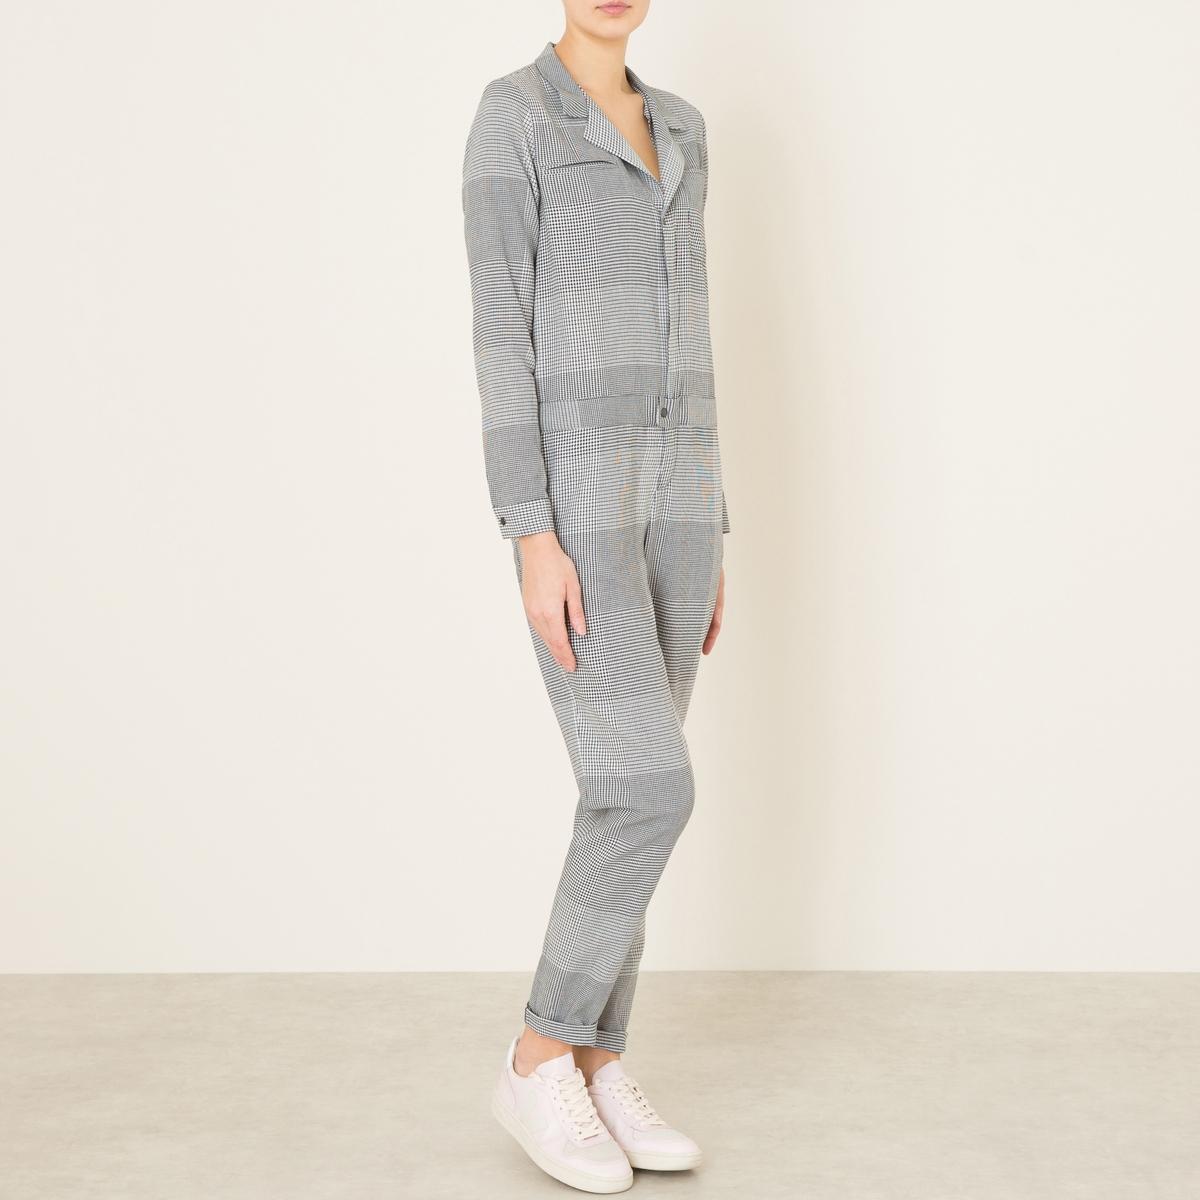 Комбинезон STUART эксклюзивно от Brand Boutique комбинезон с брюками stuart